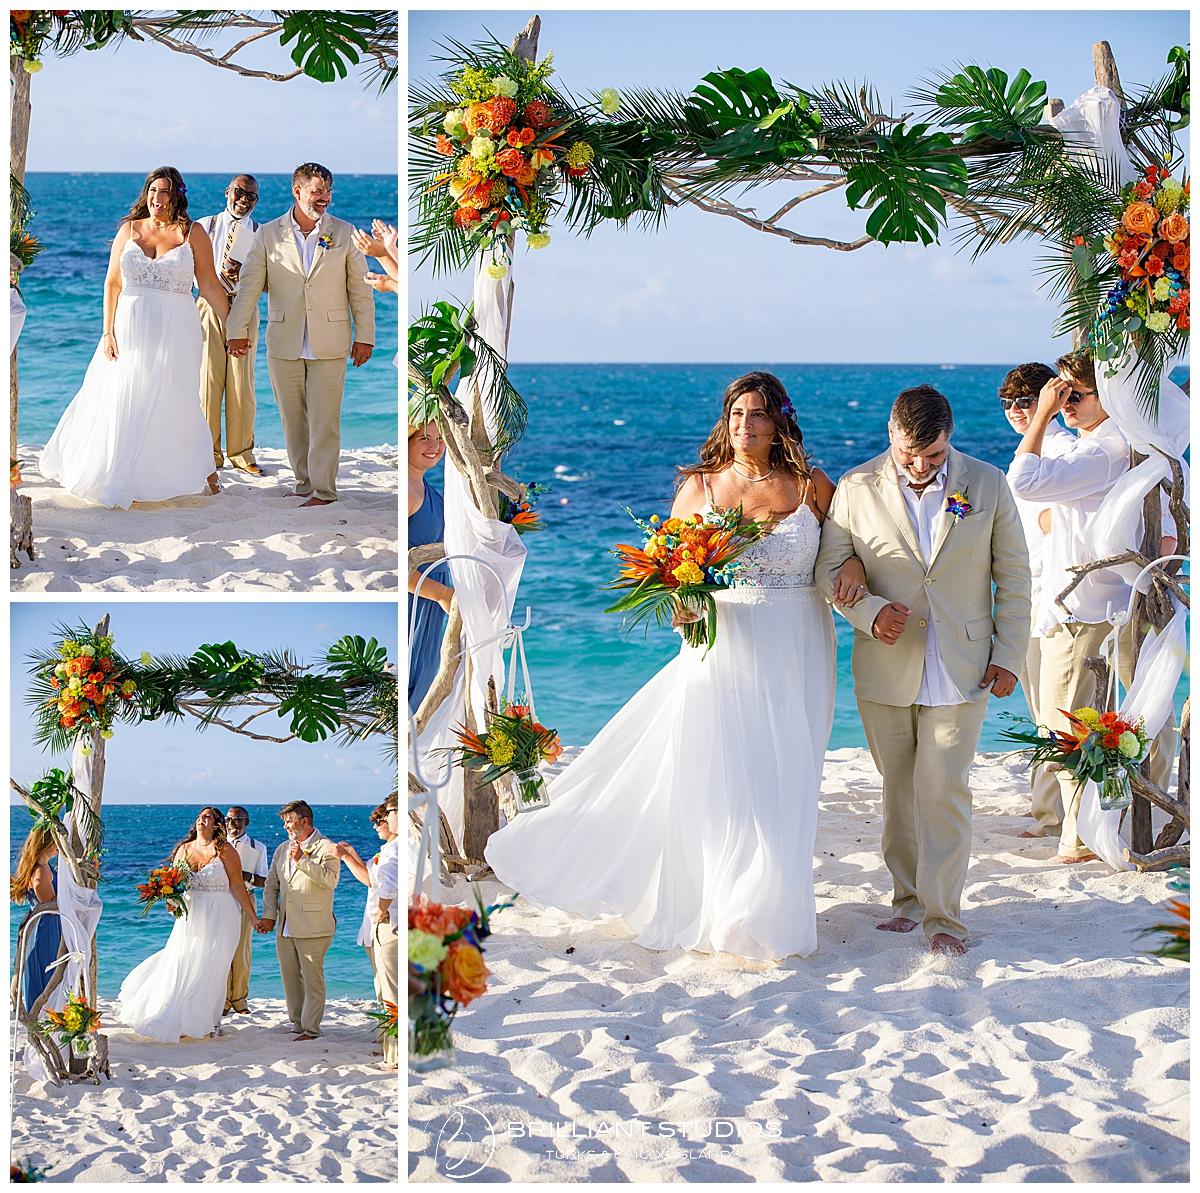 Turks and Caicos beach wedding ceremony